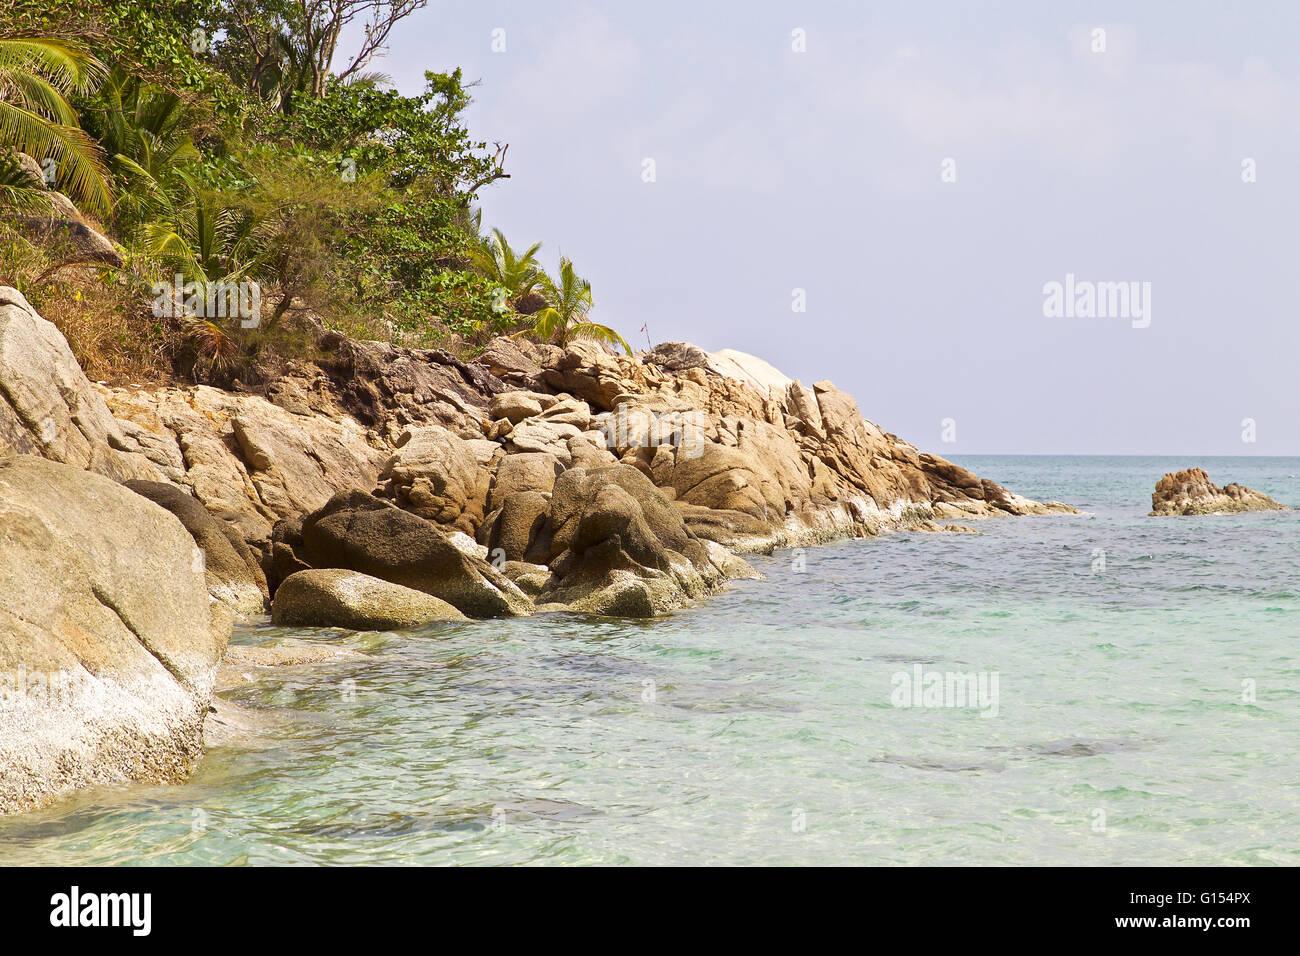 Phangan Paradise Island in the Gulf of Thailand - Stock Image